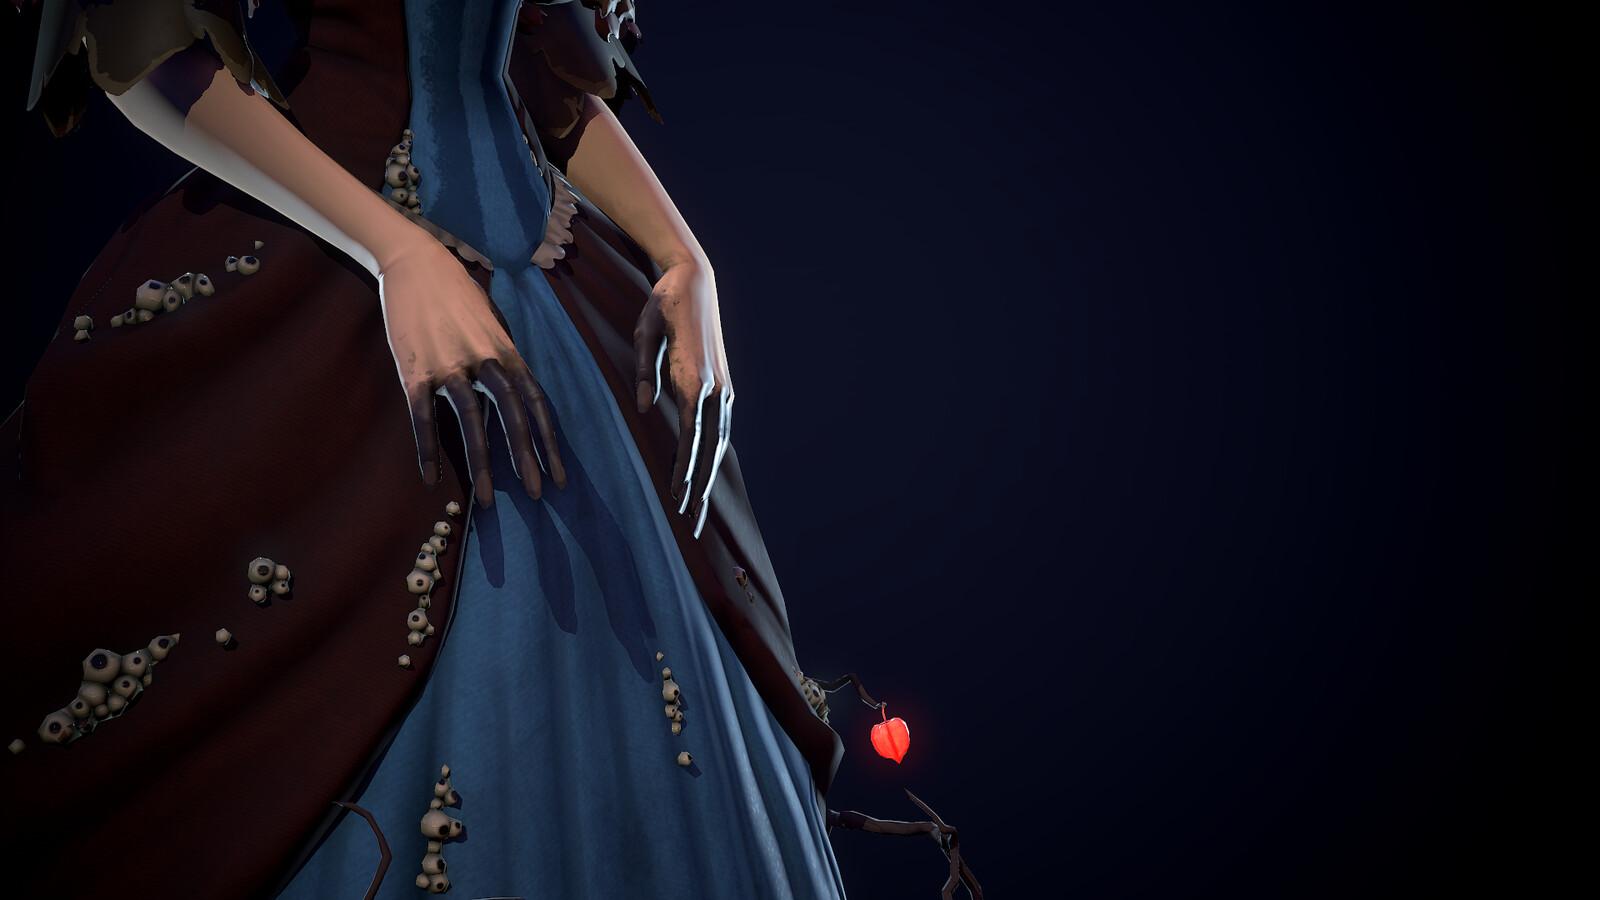 Some details